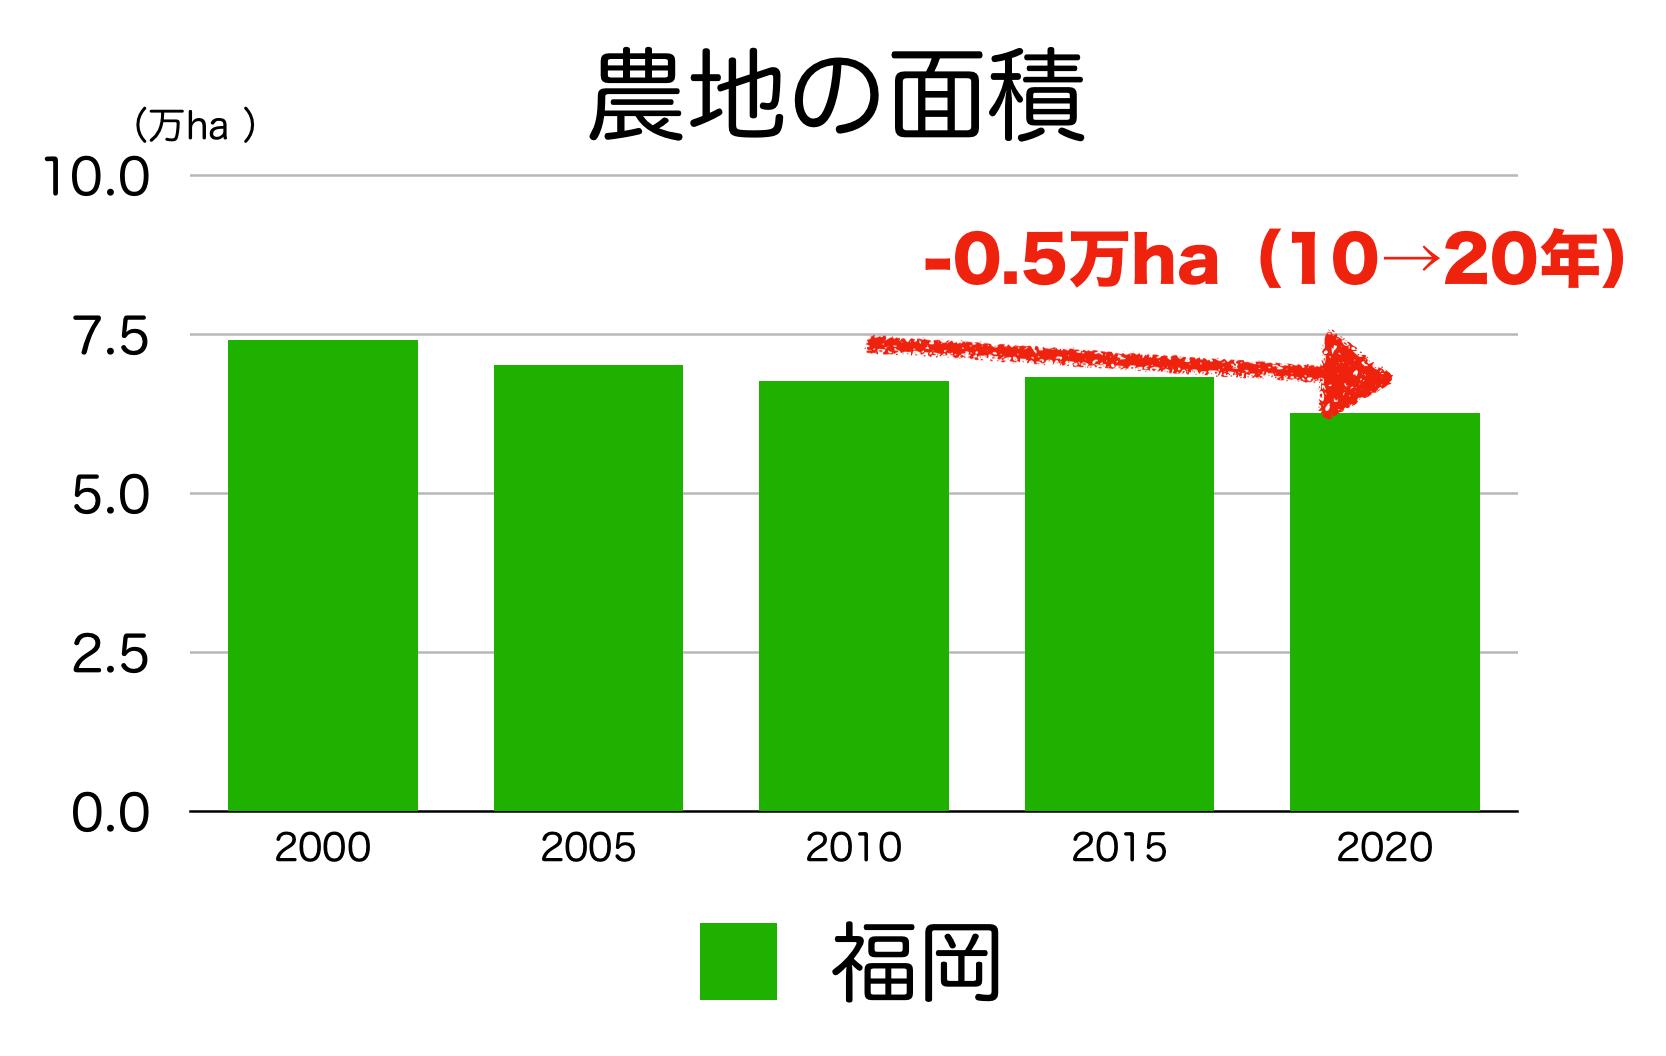 福岡県の農地面積